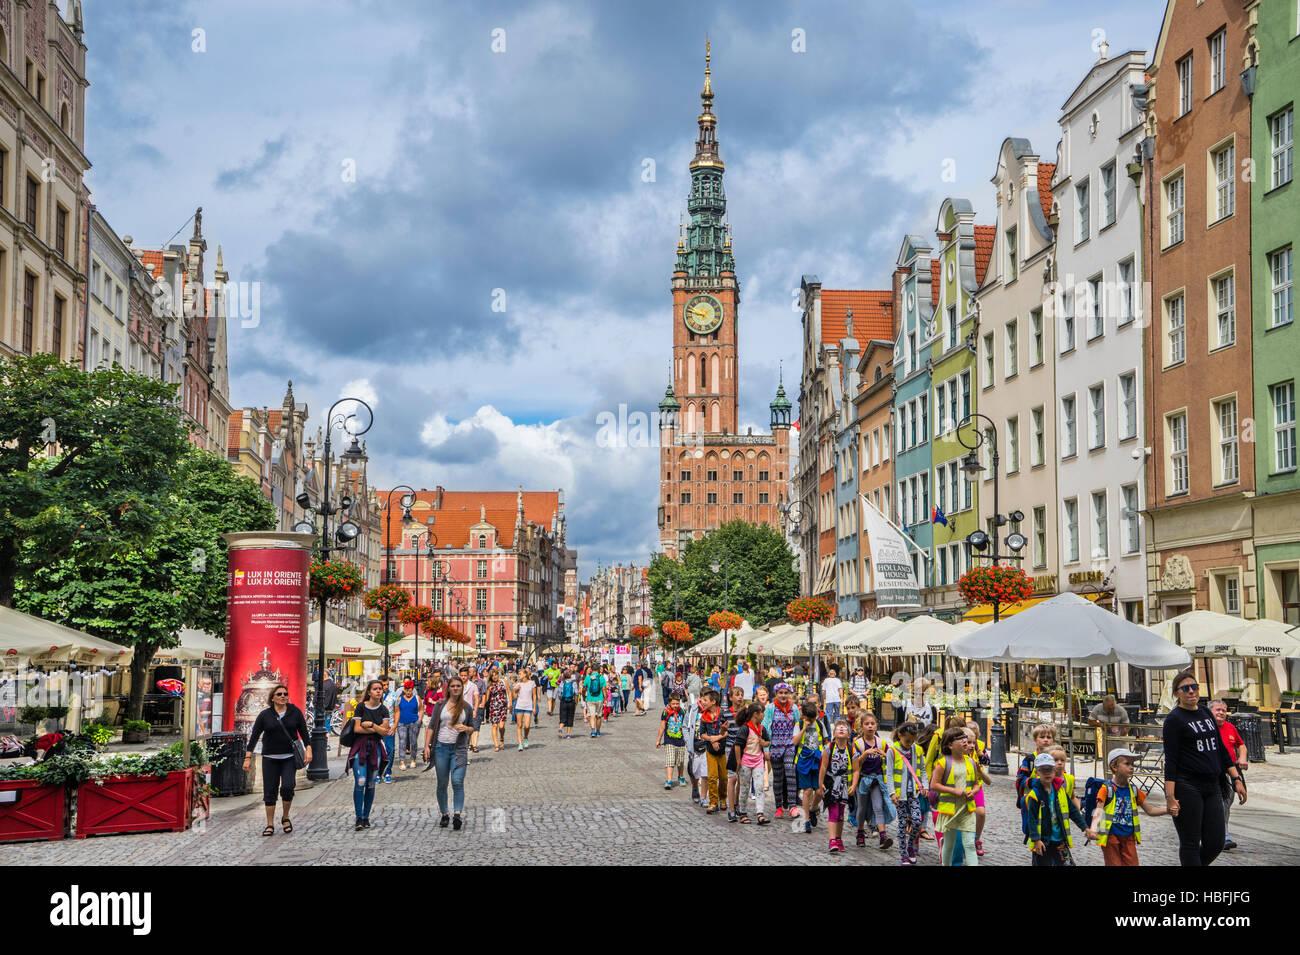 Poland, Pomerania, Gdansk (Danzig), Long Market (Langer Markt/Dlugi Targ) with view of the prominent spire of the - Stock Image